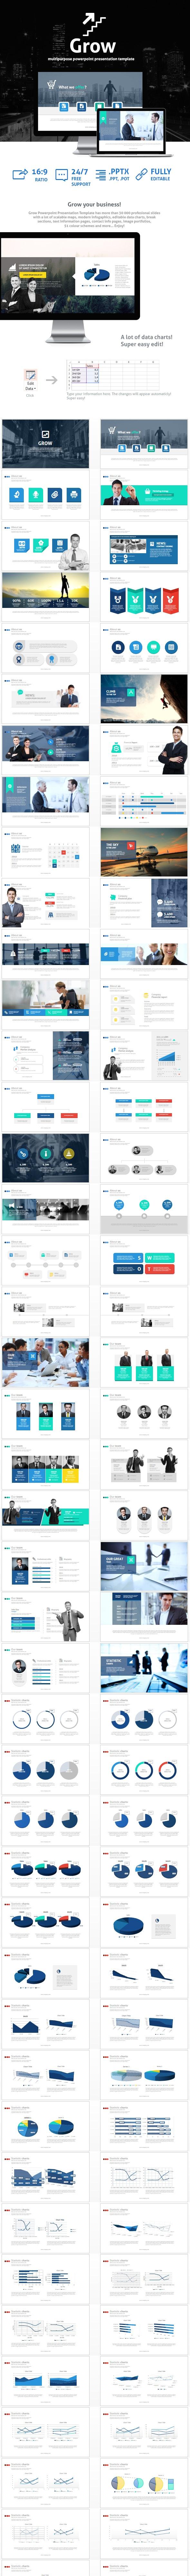 Grow Powerpoint Presentation Template - Business PowerPoint Templates